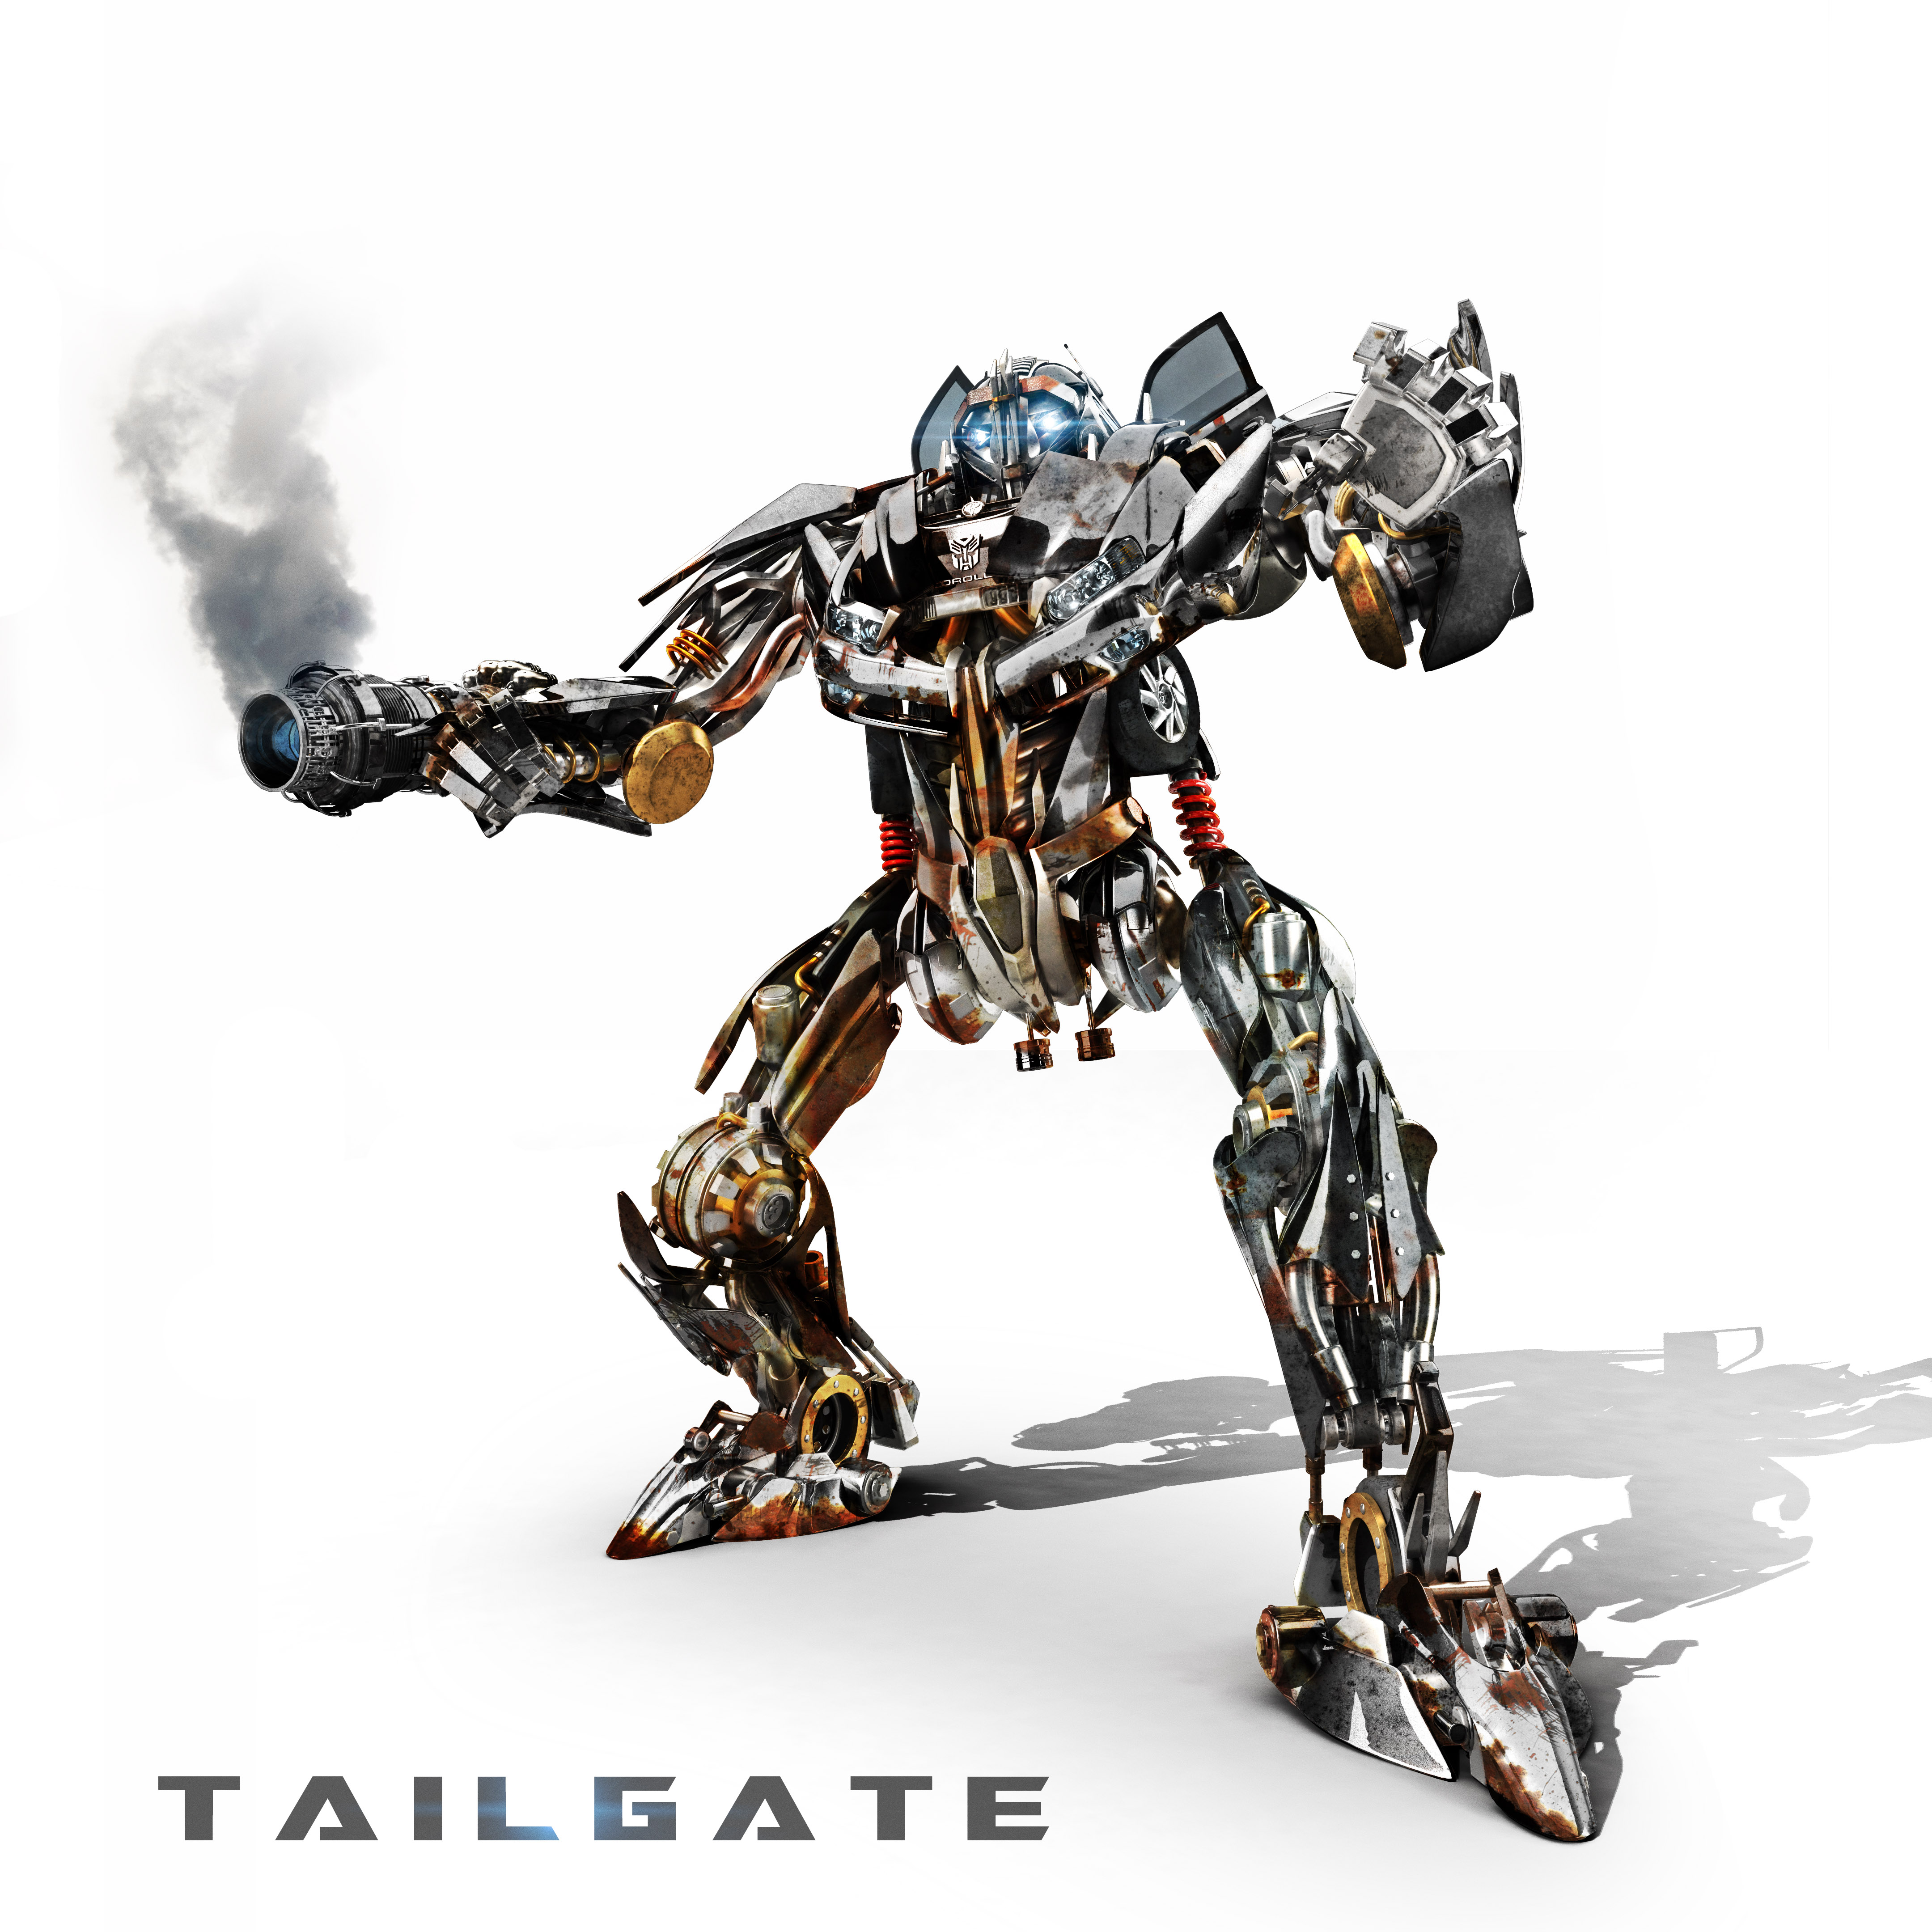 Transformer: Tailgate 3d art